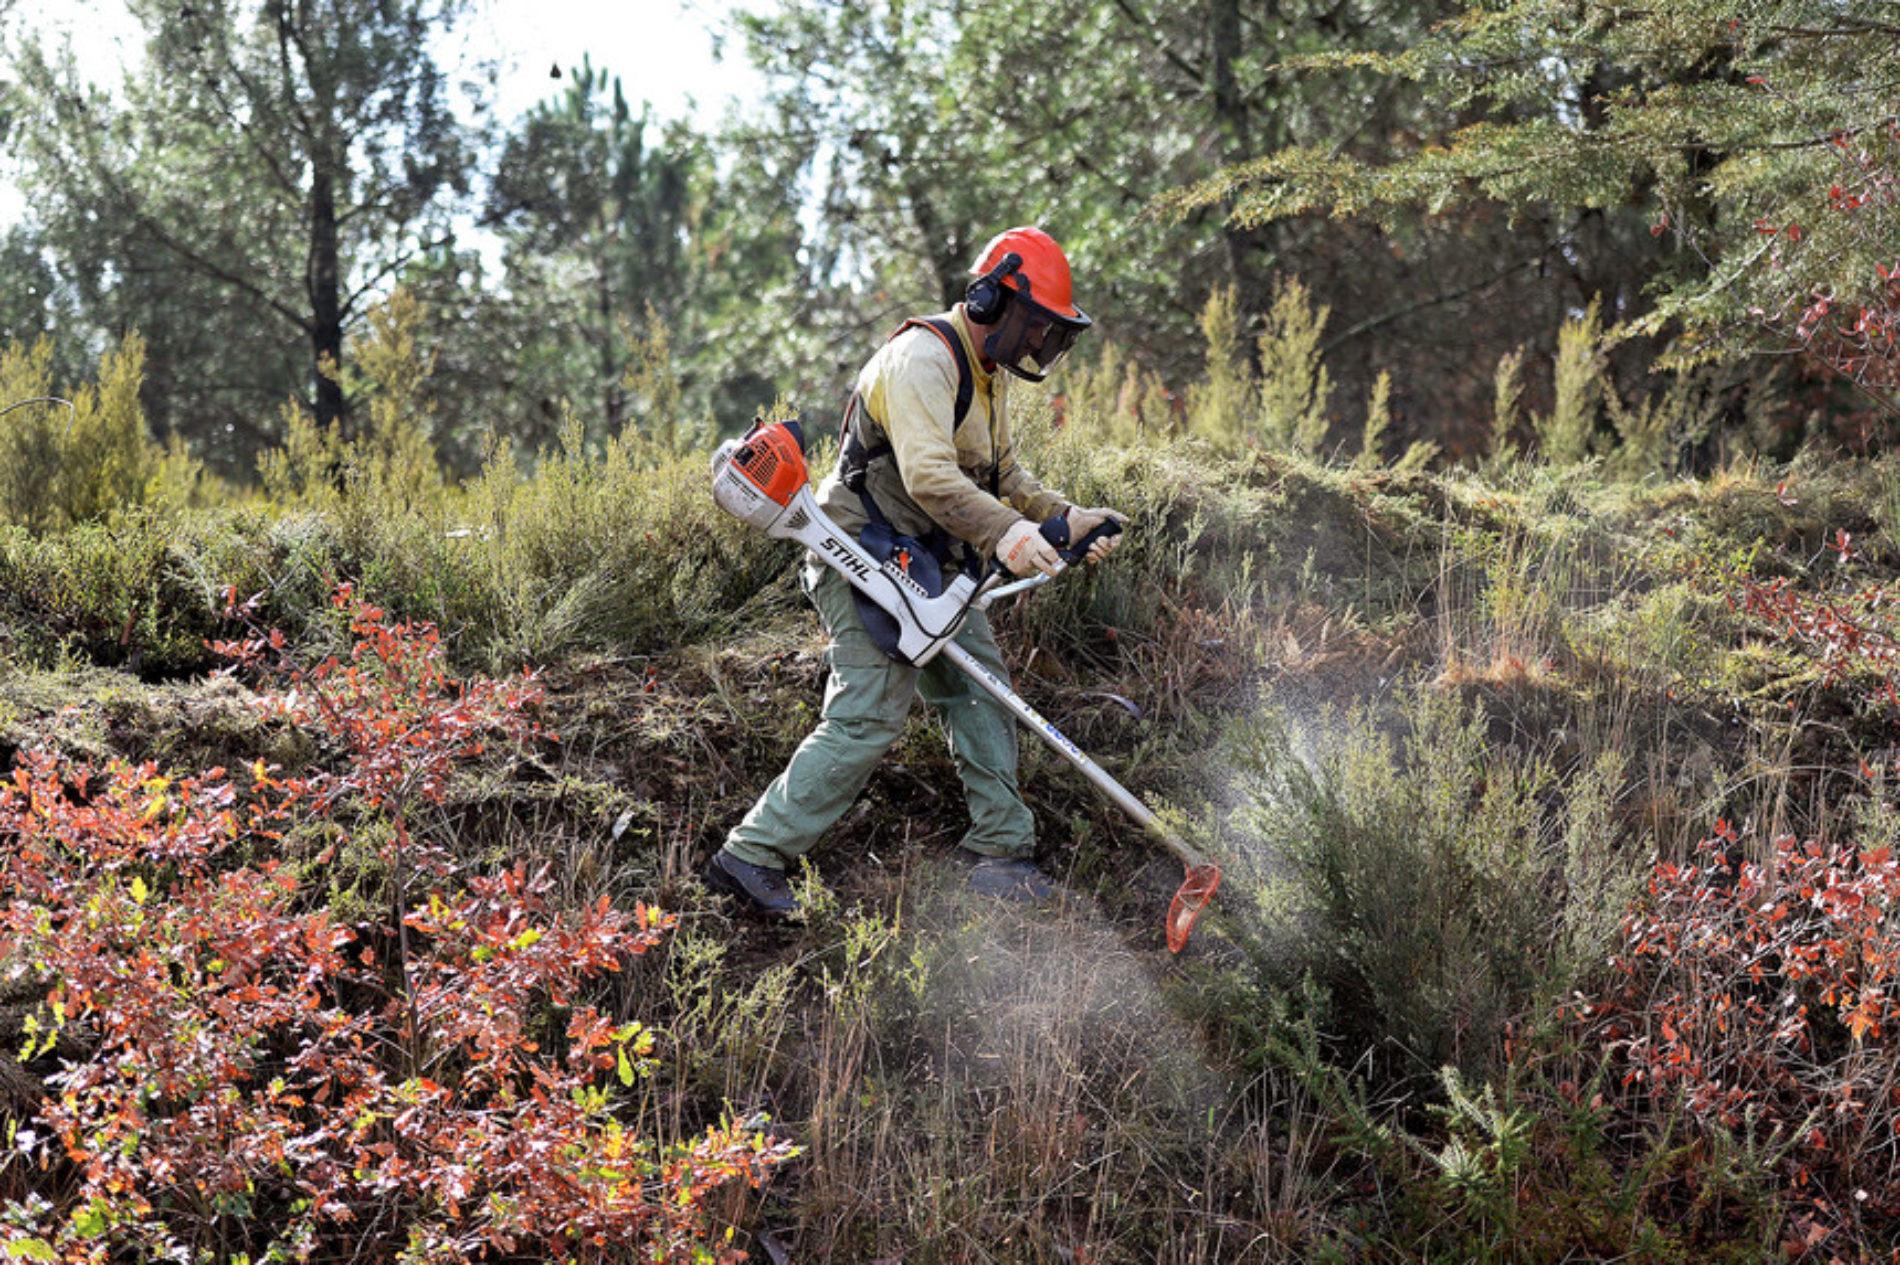 Limpeza de terrenos tem de estar concluída até 15 de março